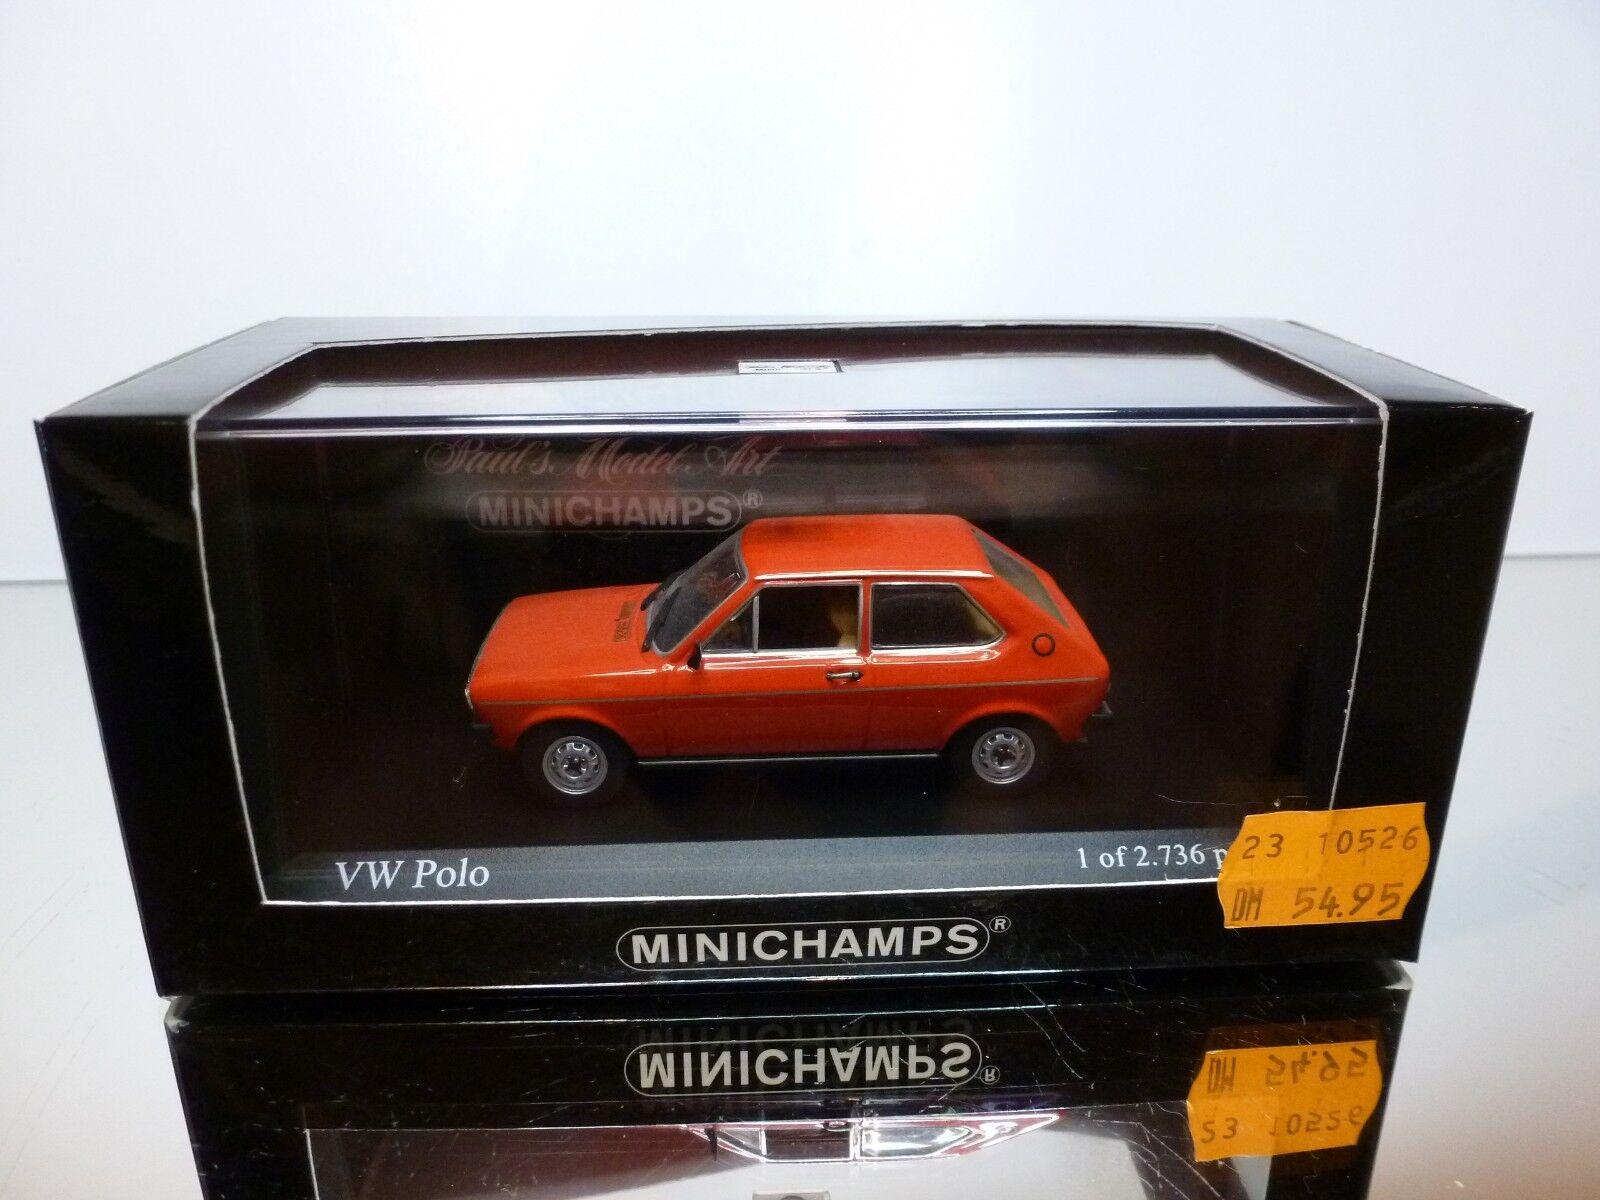 MINICHAMPS 50500 VW VOLKSWAGEN POLO 1975 - rosso 1:43 RARE - EXCELLENT IN BOX